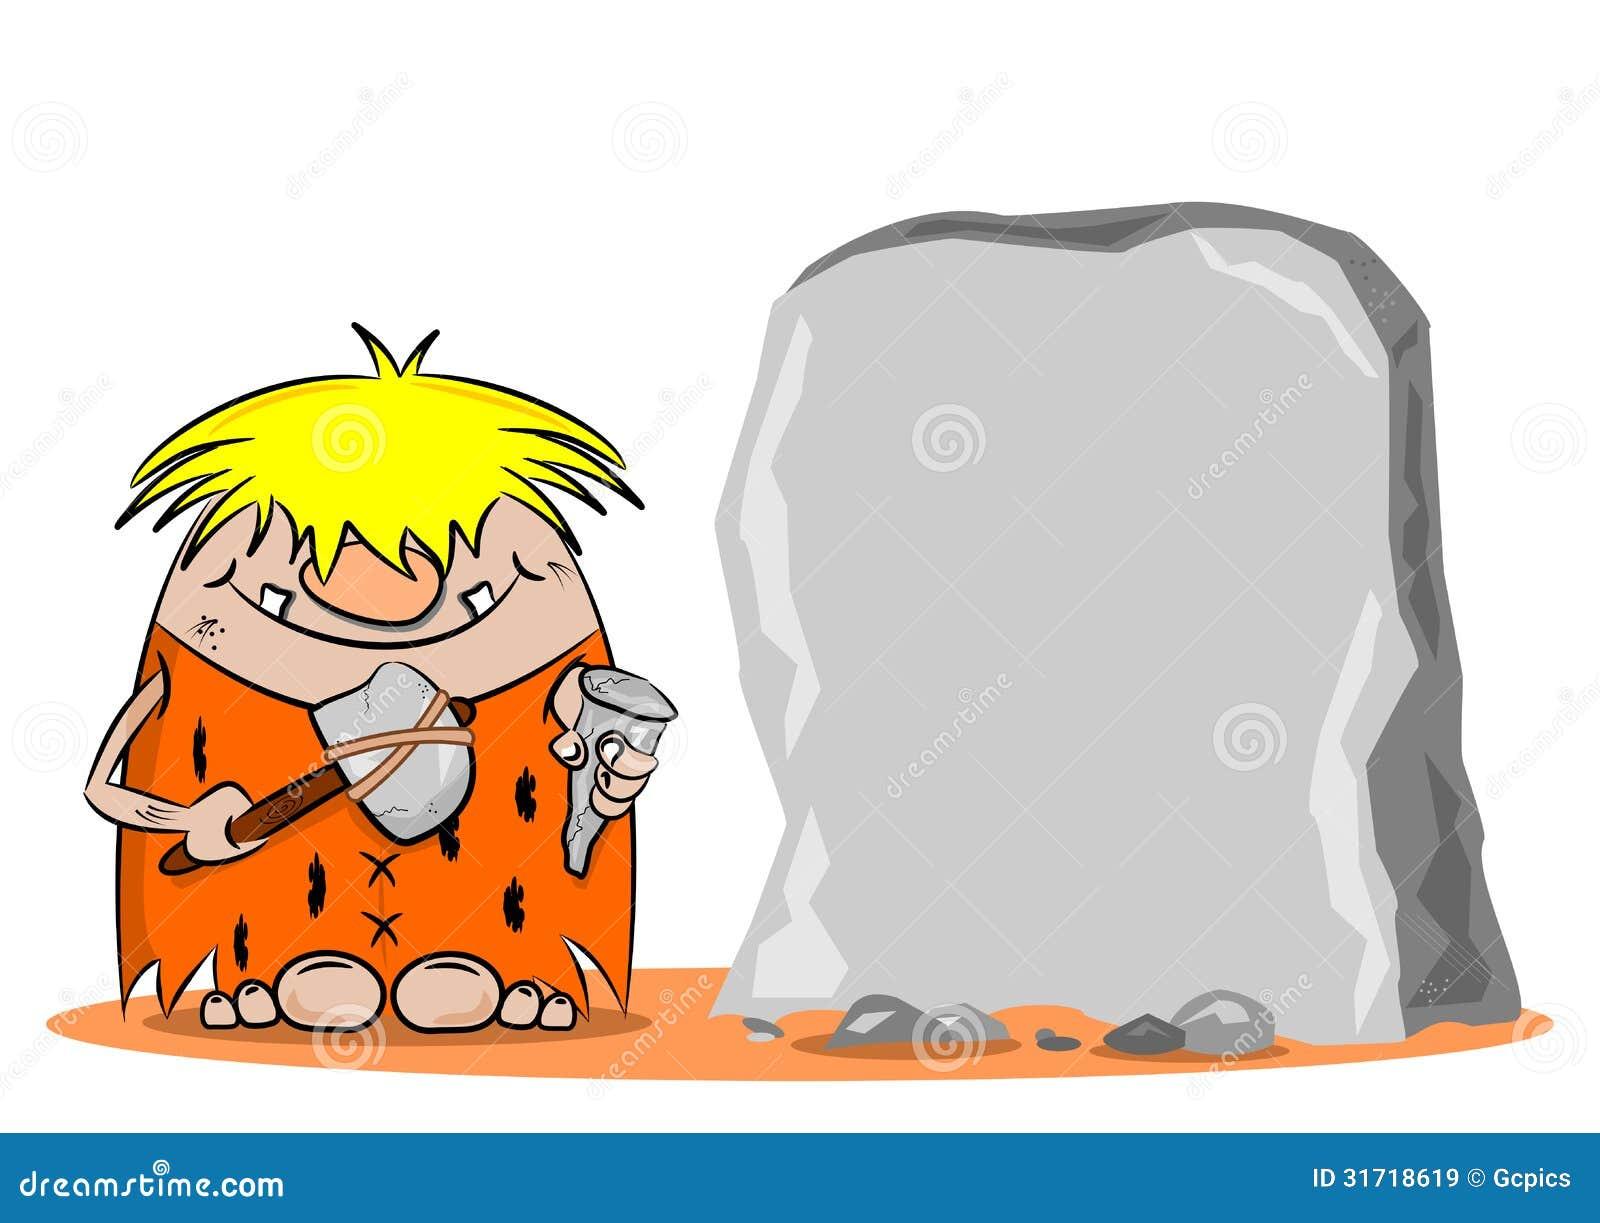 Caveman Hammer : A cartoon caveman with hammer and chisel stock vector